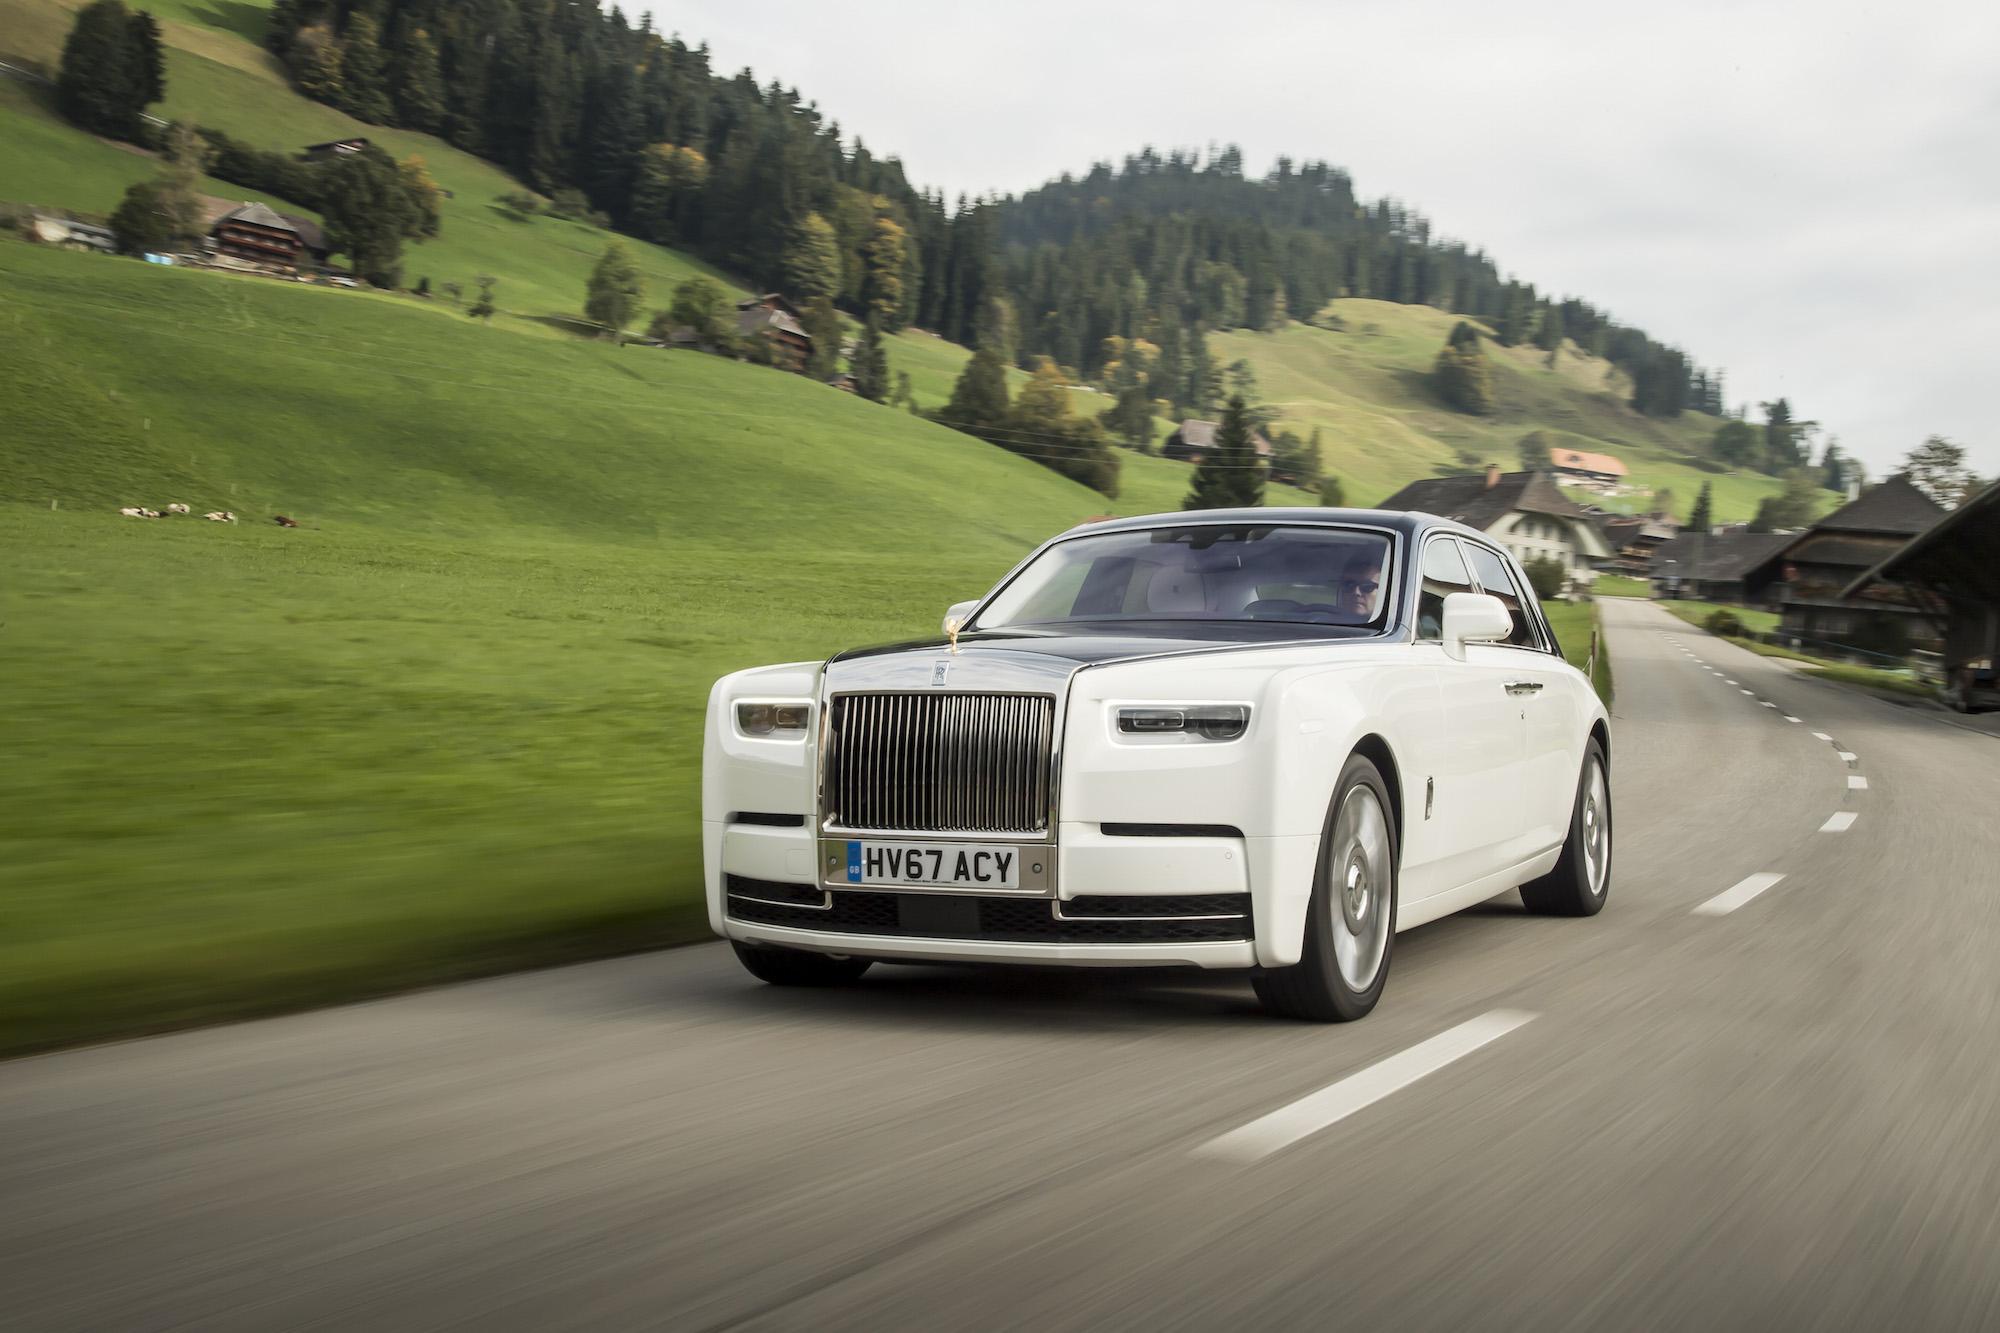 First Look: 2018 Rolls-Royce Phantom VIII | Canadian Auto ...